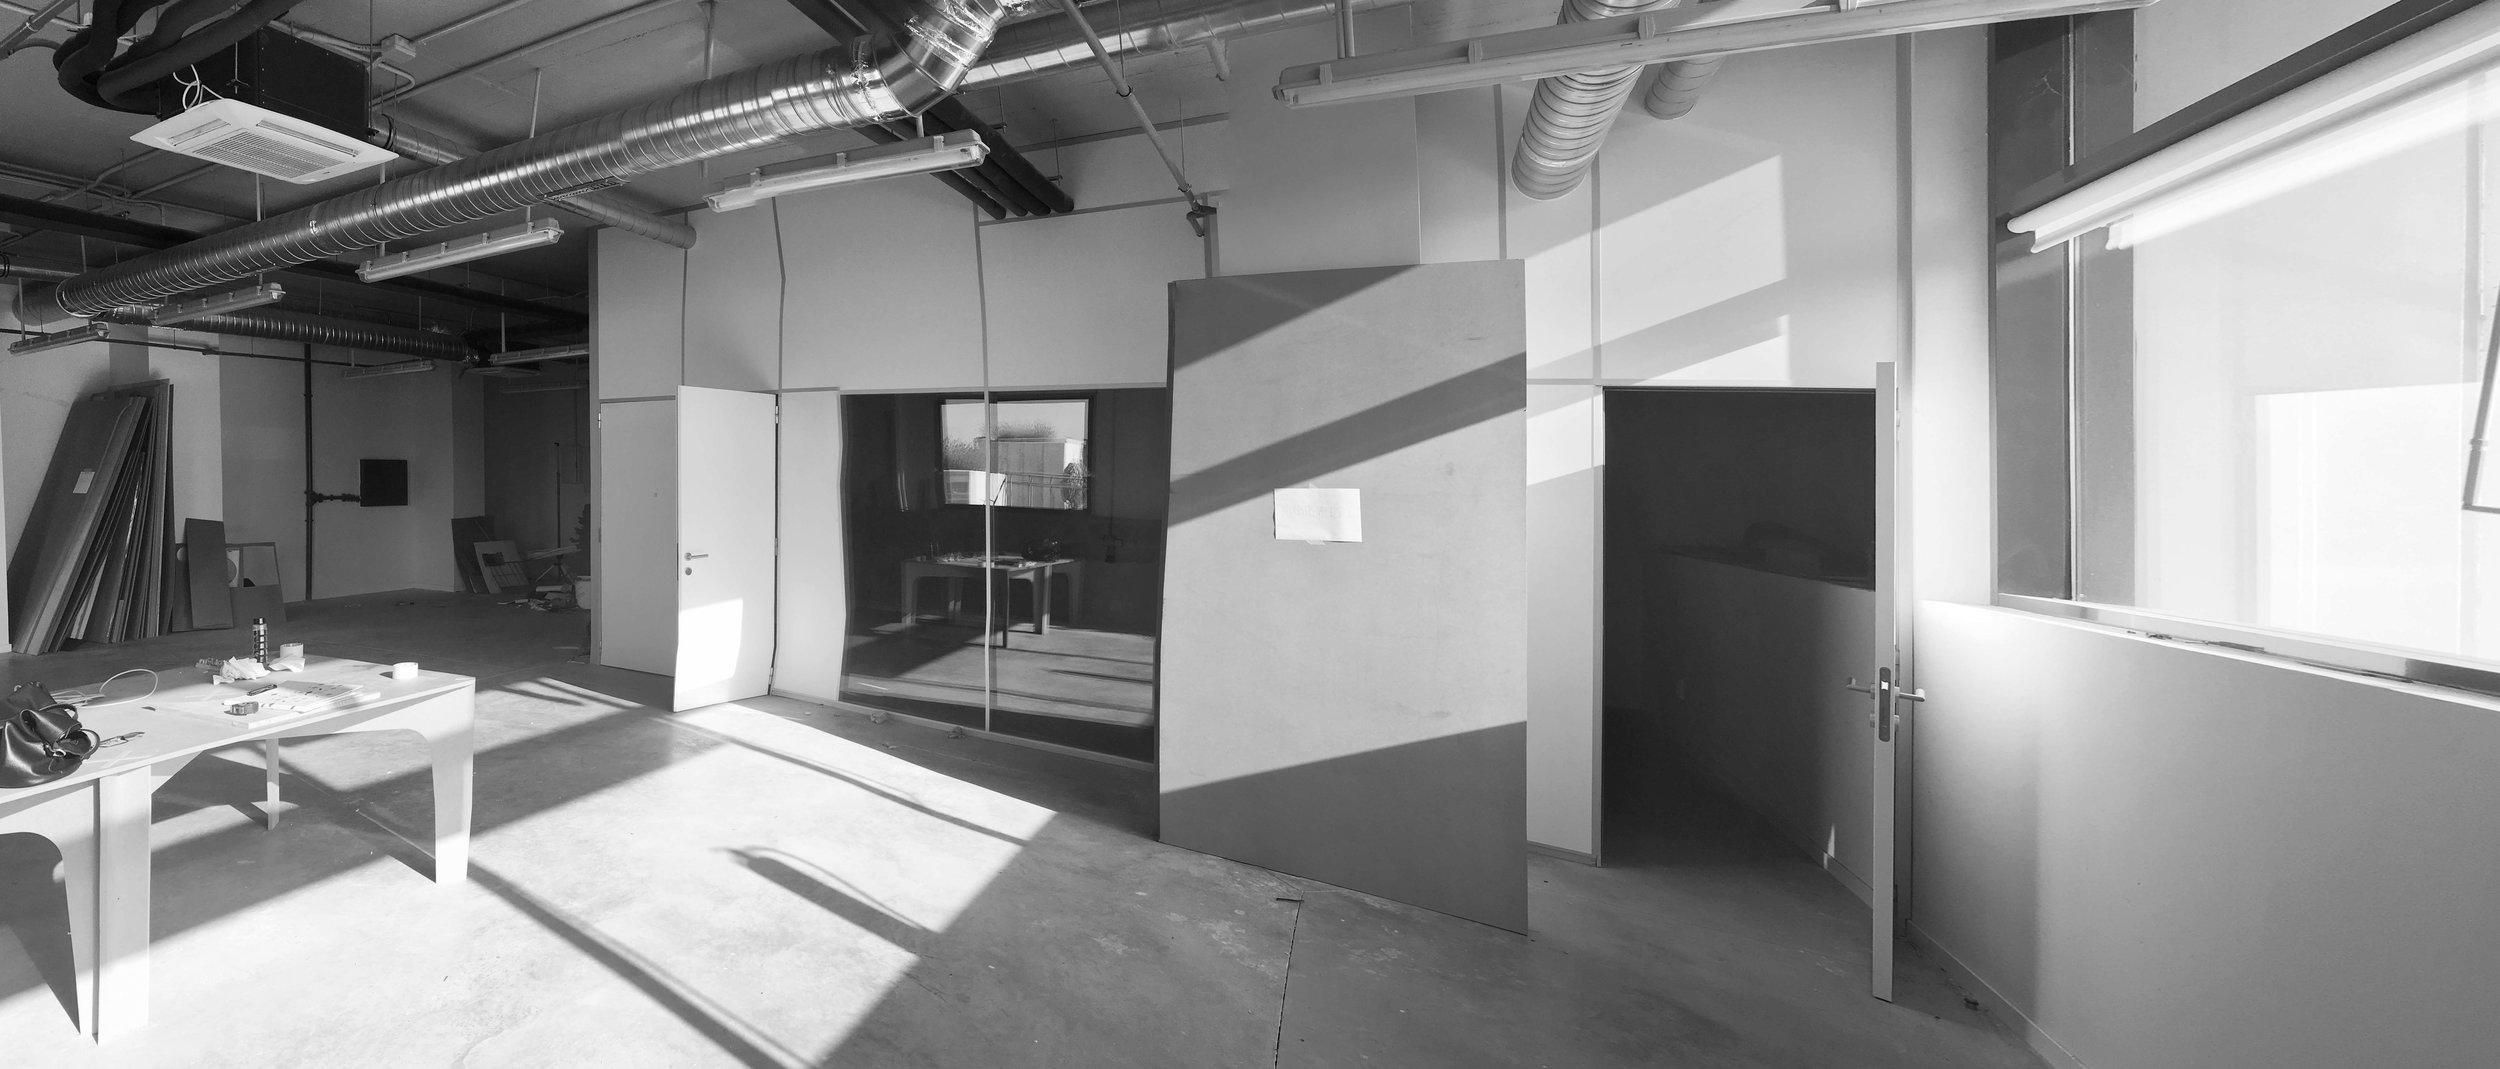 LivingLab UPM emmme studio IKEA - 05 - SM.jpg